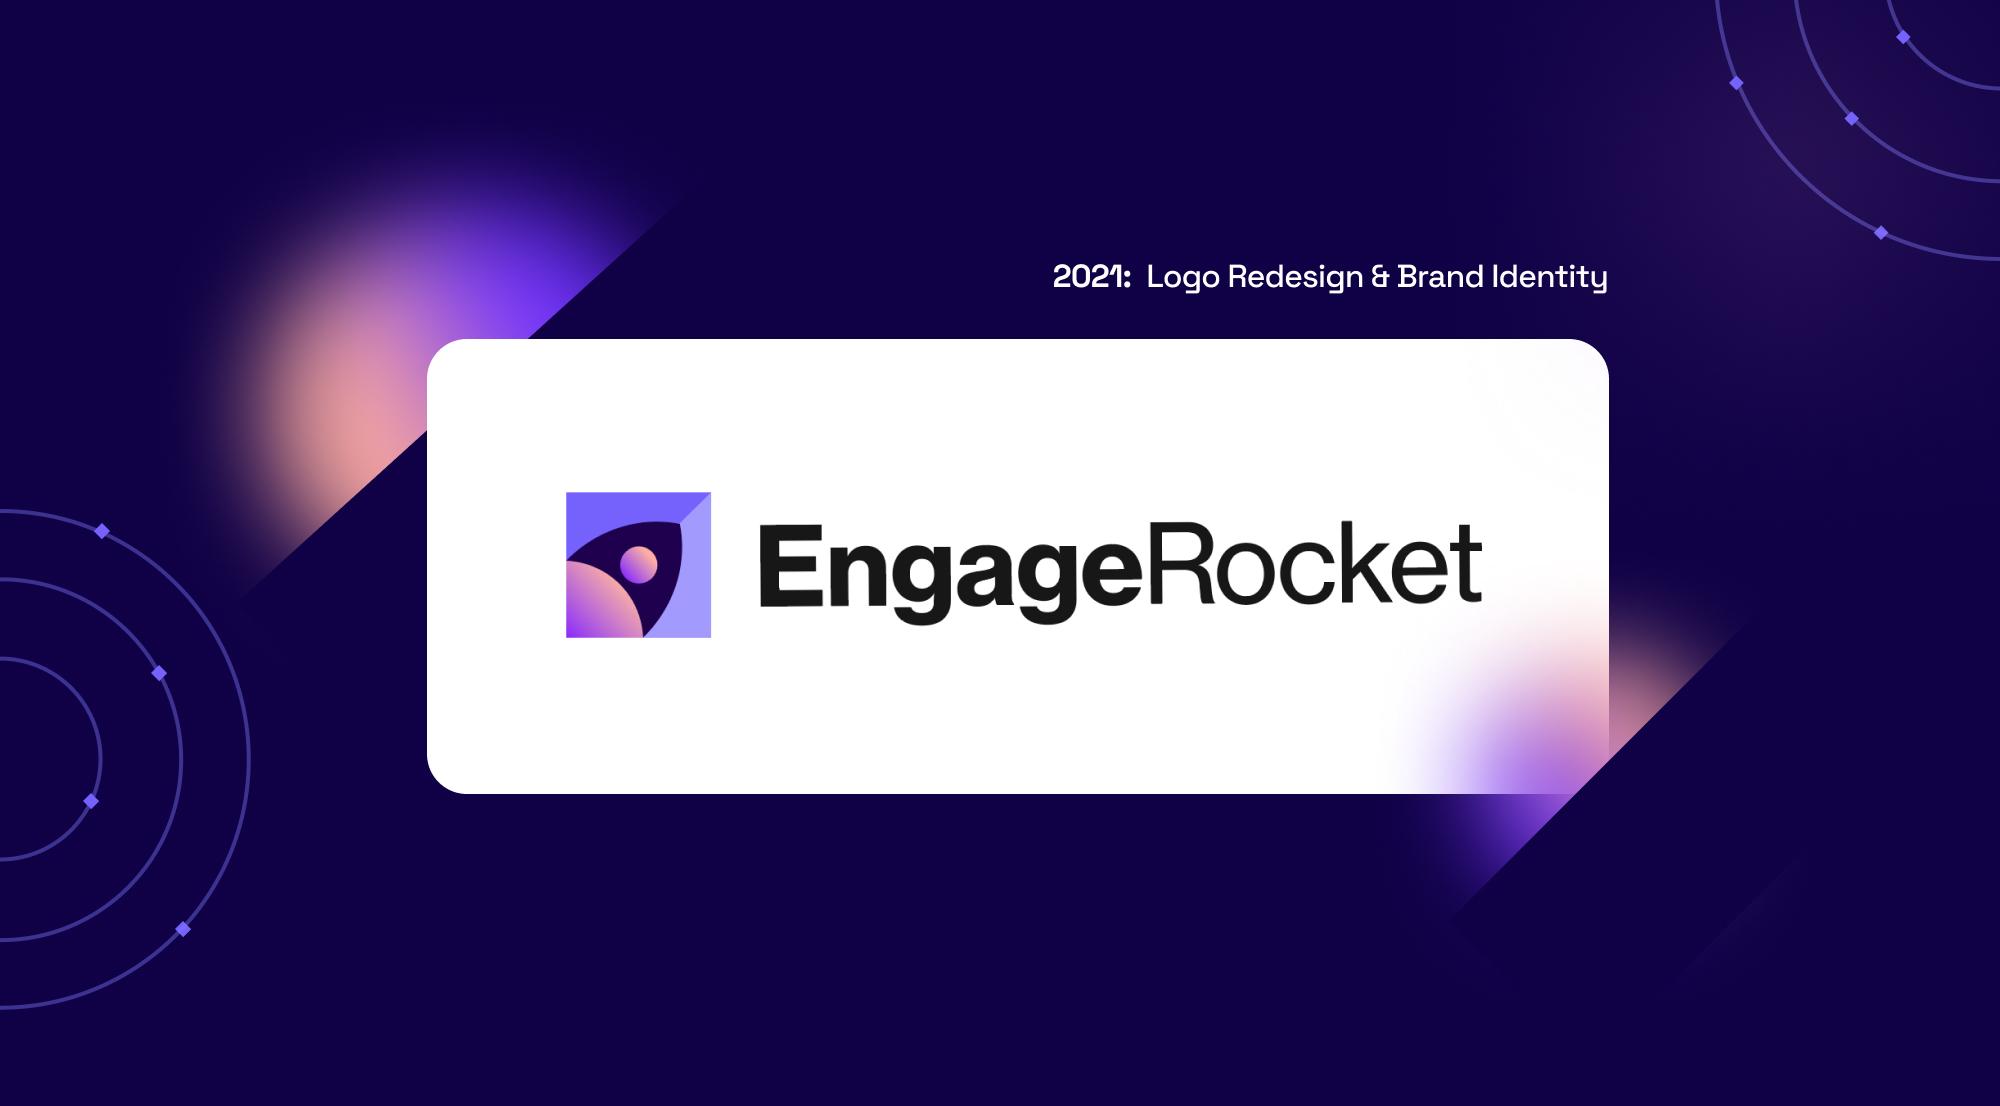 EngageRocket 2021: New Identity, Stronger Mission